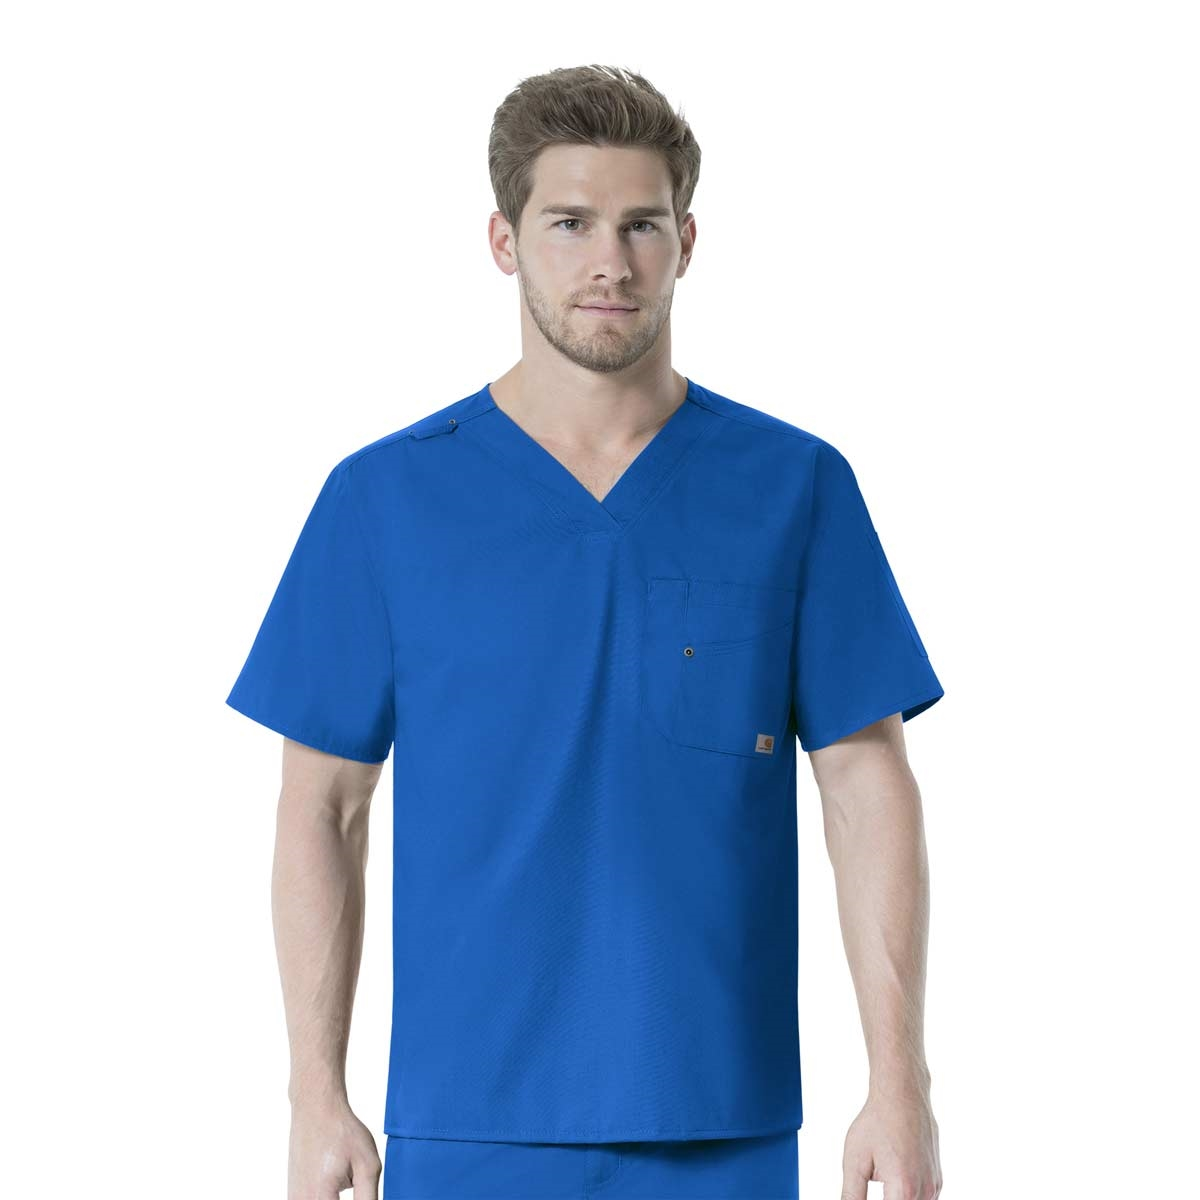 feeb40f96f7 WonderWink Scrubs | Professional Scrub Tops for Men